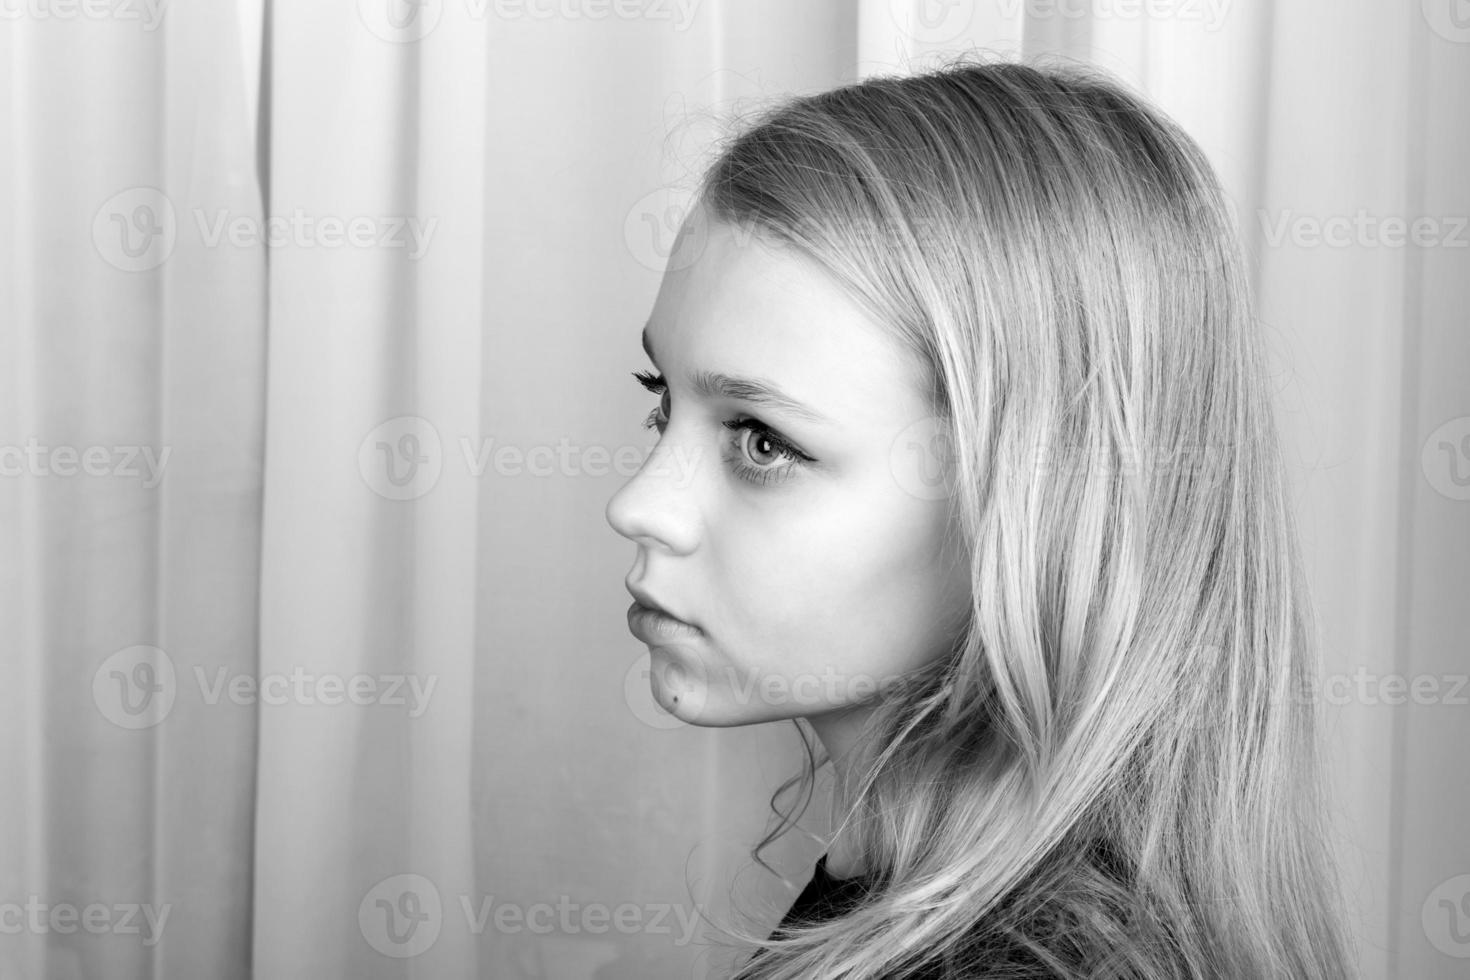 séria loira caucasiana, retrato monocromático foto